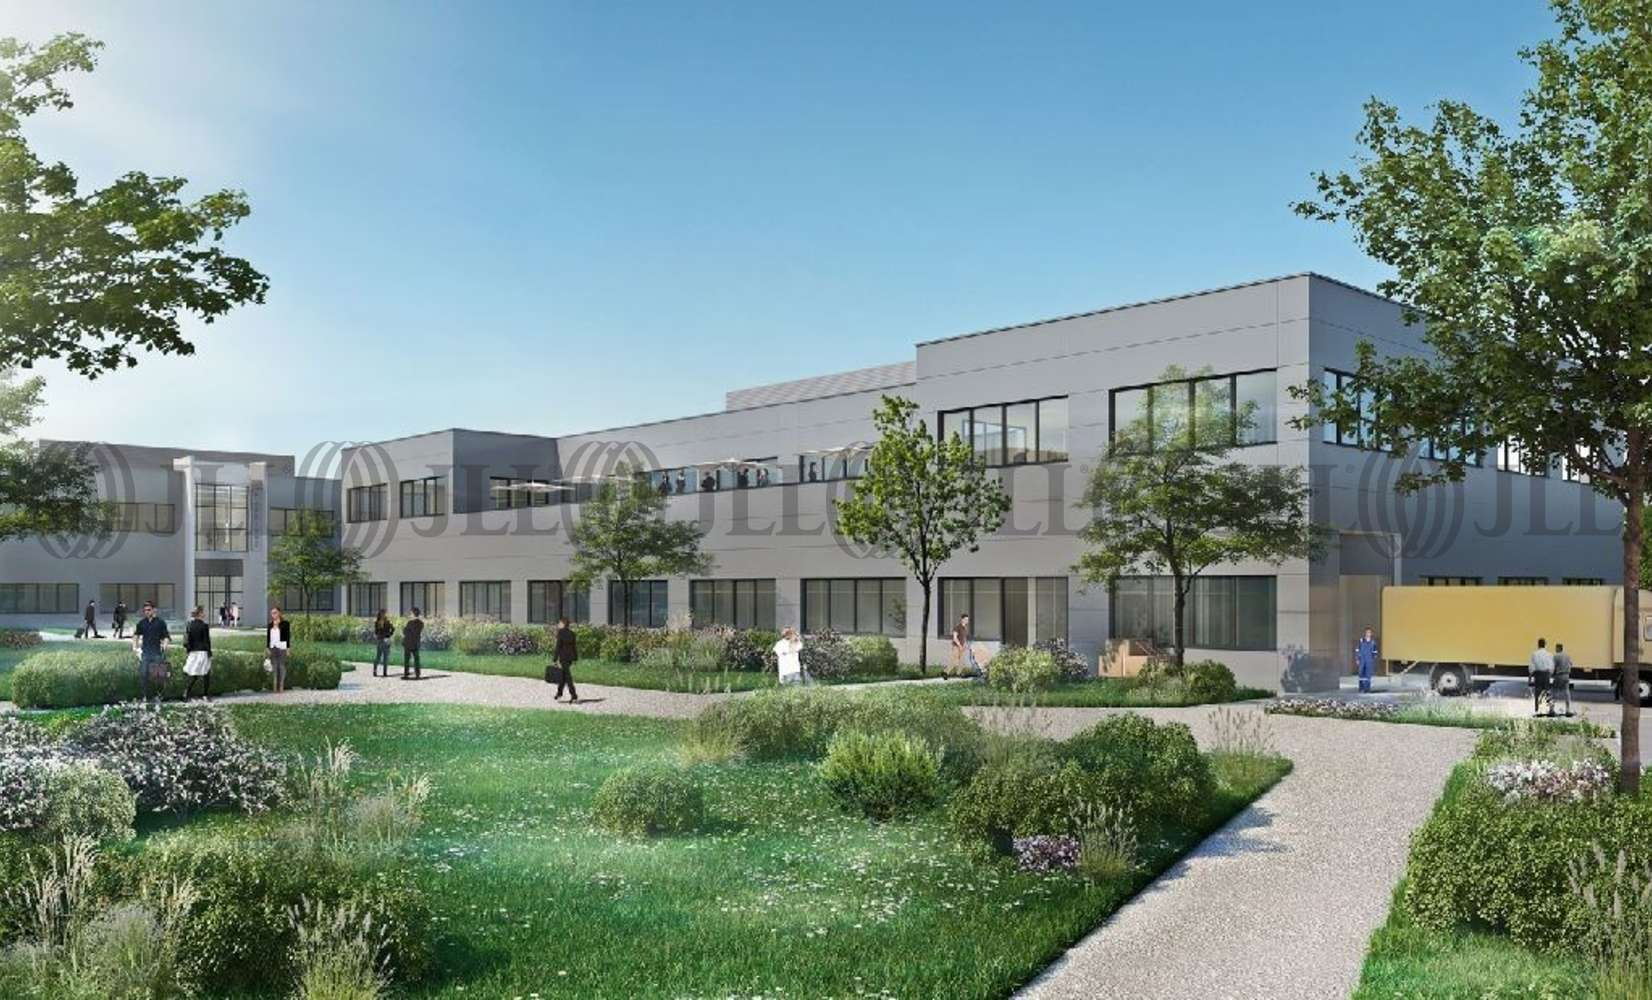 Bureaux Lyon, 69007 - GERLAND TECHNOPARK II : Phase 2 - Mixte - 10884202